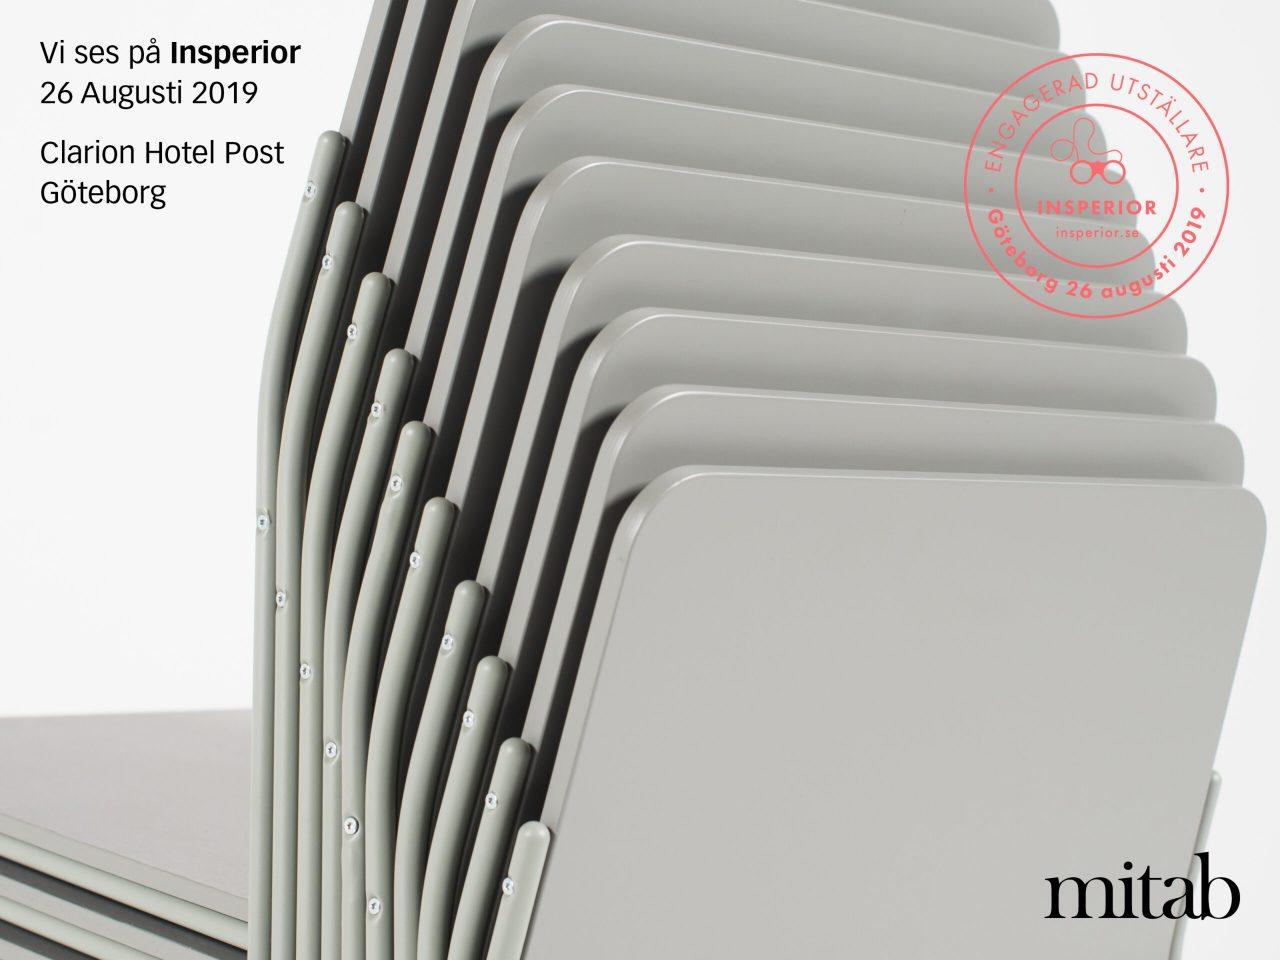 Mitab_Insperior_3200x2400px2